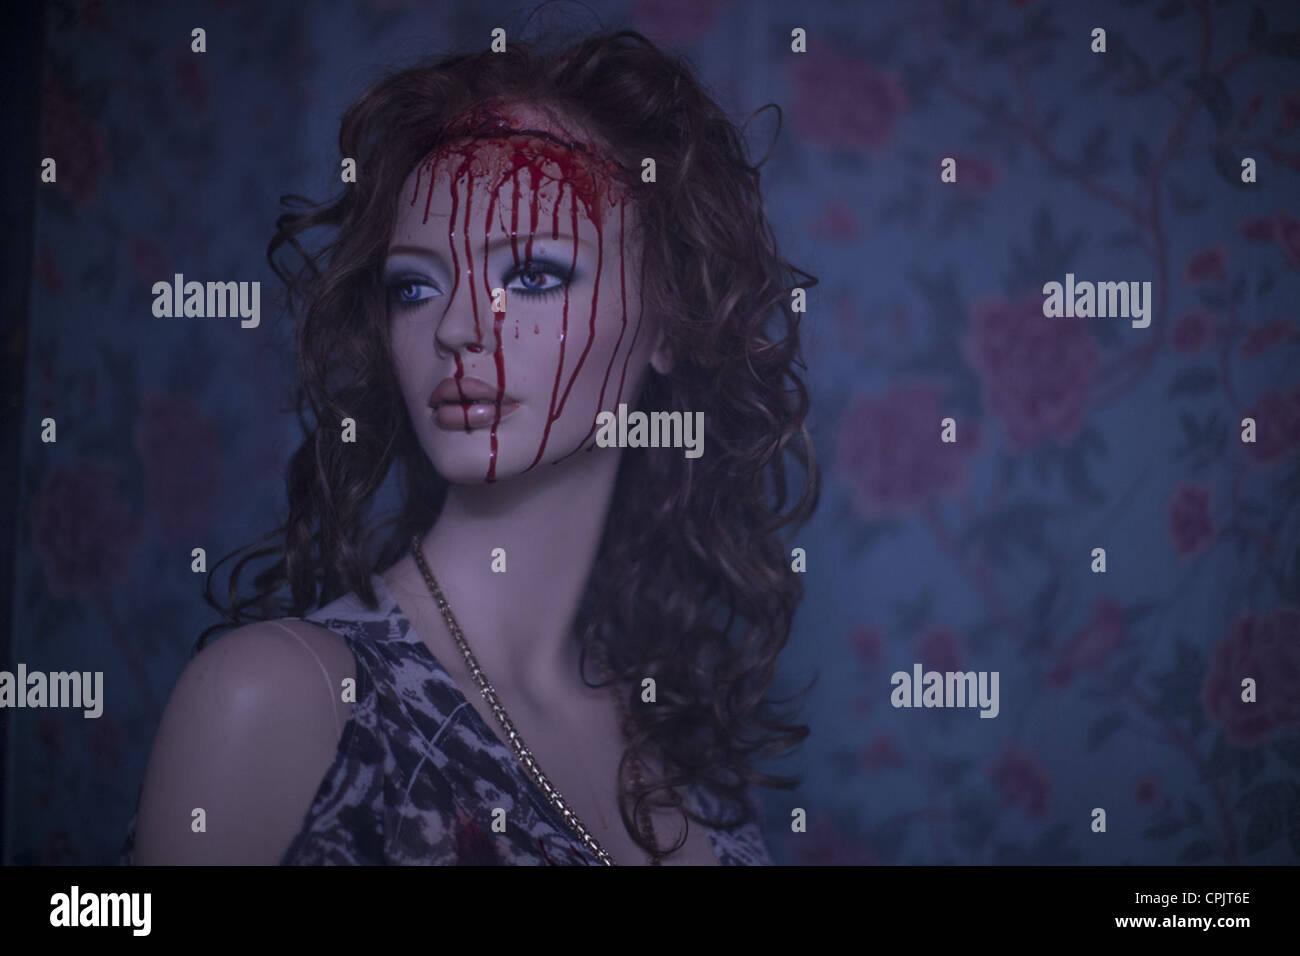 MANIAC (2012) FRANCK KHALFOUN (DIR) 002 MOVIESTORE COLLECTION LTD - Stock Image